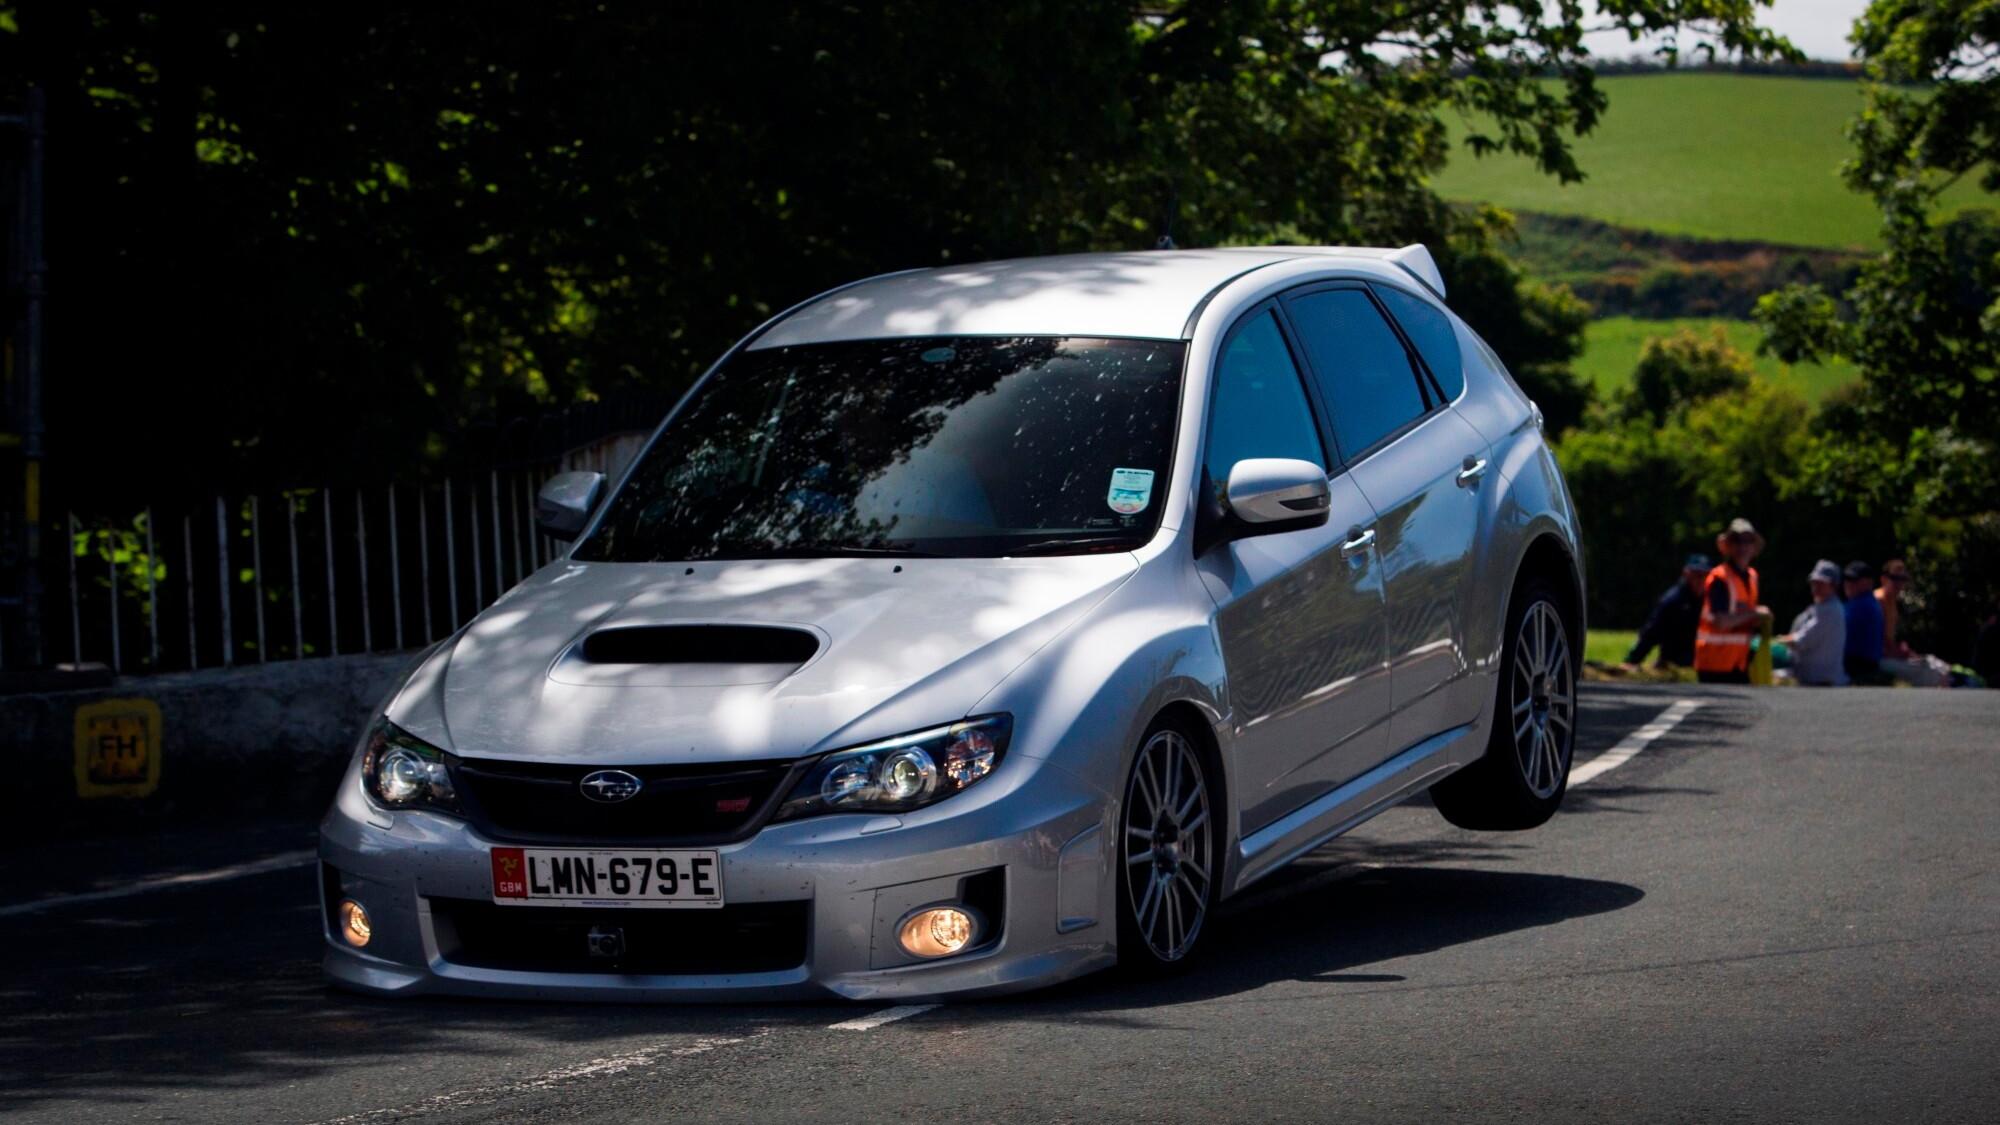 2013 Subaru WRX STI, Ireland and the Isle of Man, 2013